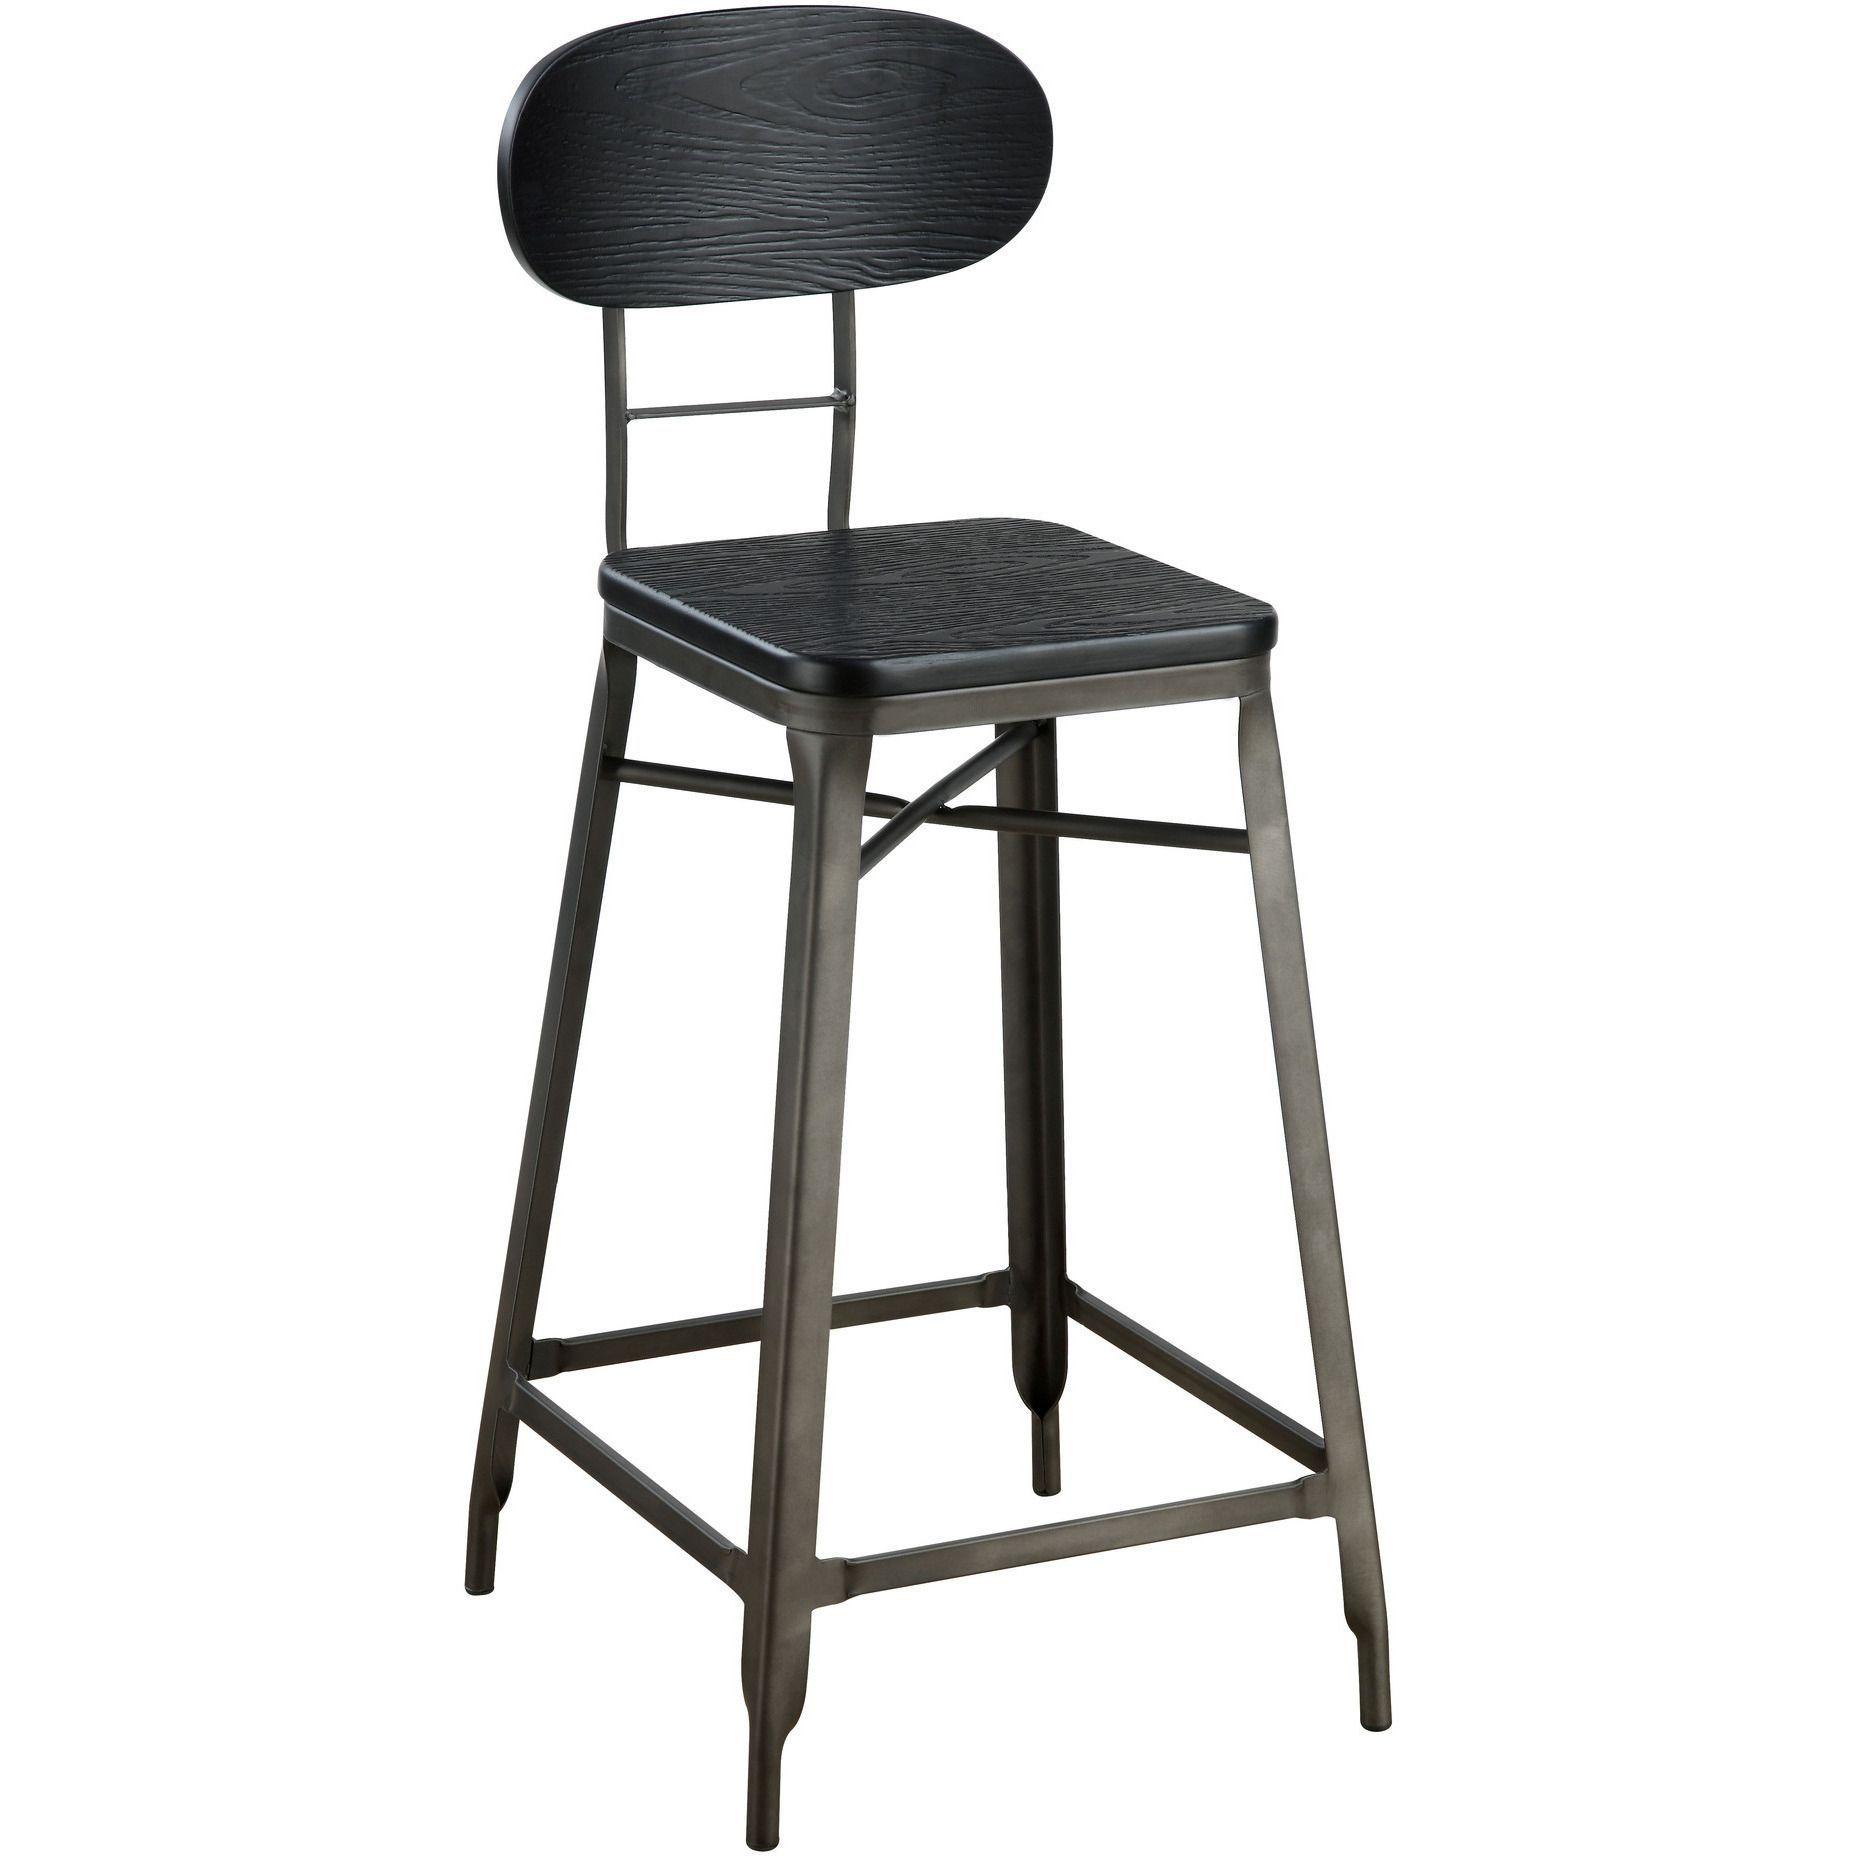 Privett Industrial 24 Inch Bar Chair Set Of 2 In Dark Steel